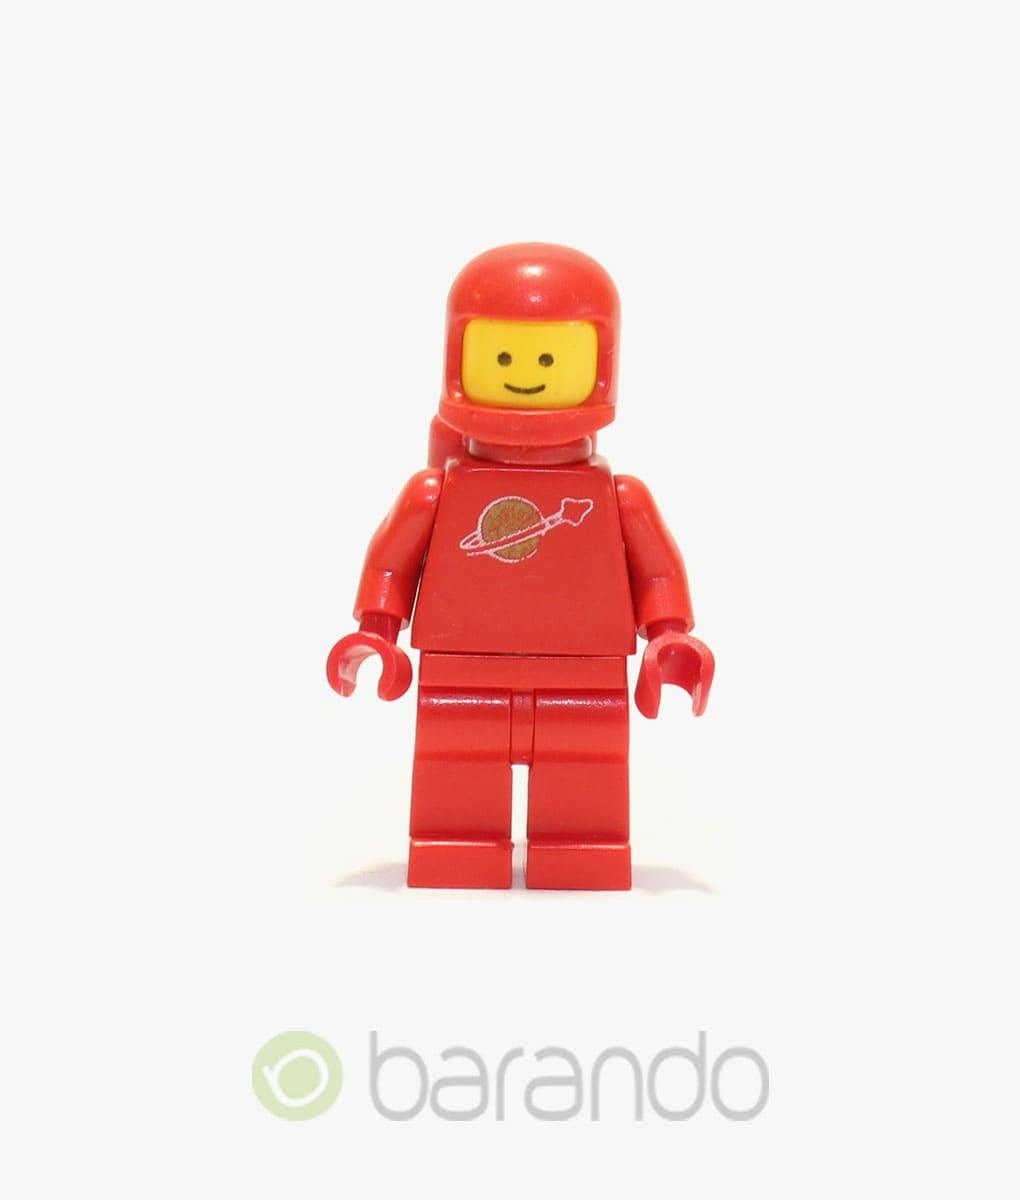 Lego Classic Space Sp005 Online Kaufen Barando